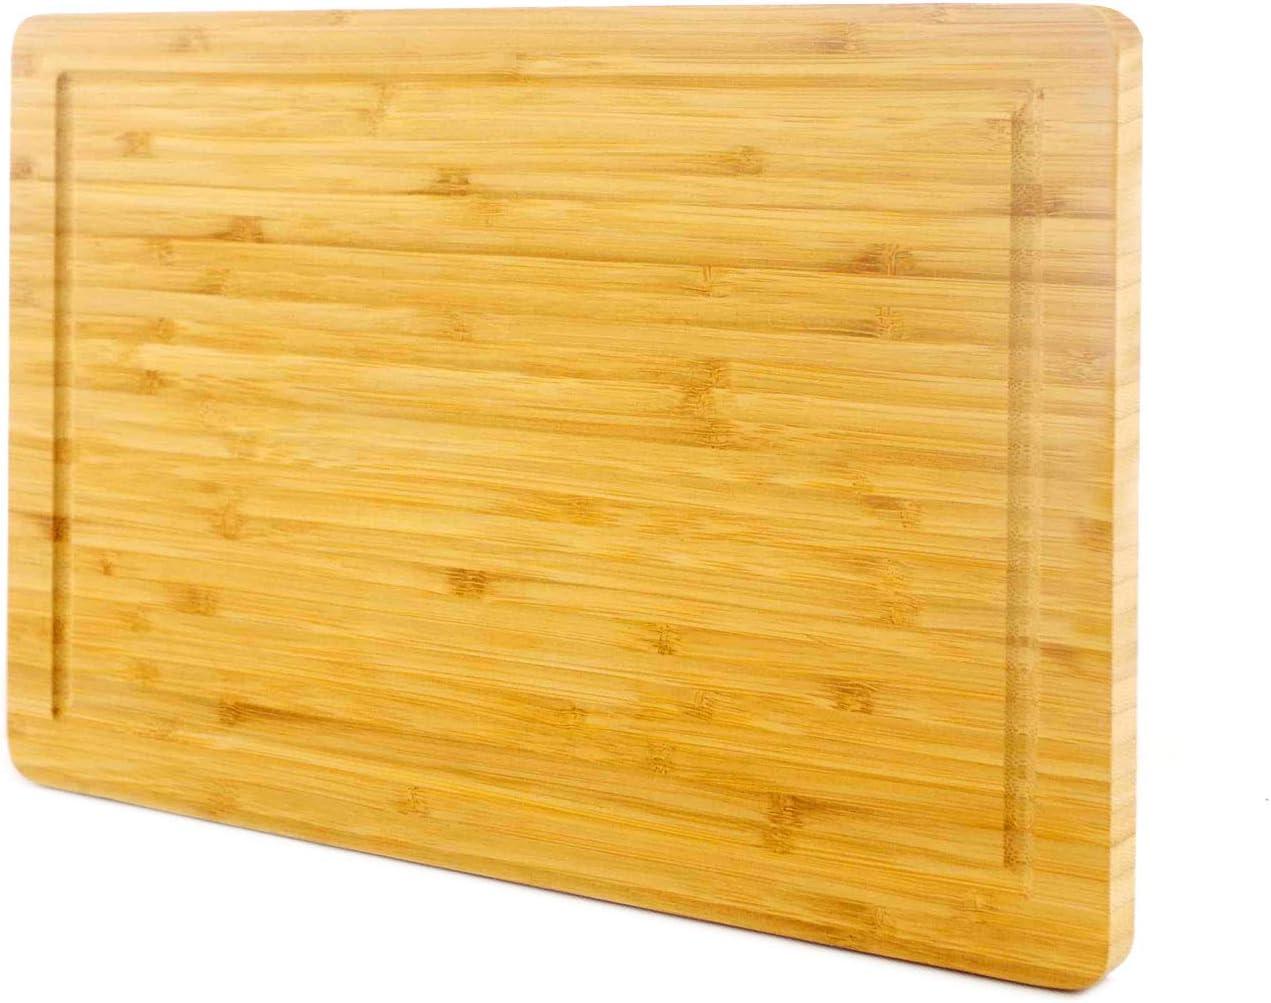 Multi Wood Kitchen Gift Bread Board Rectangle Cheese Cutting Board